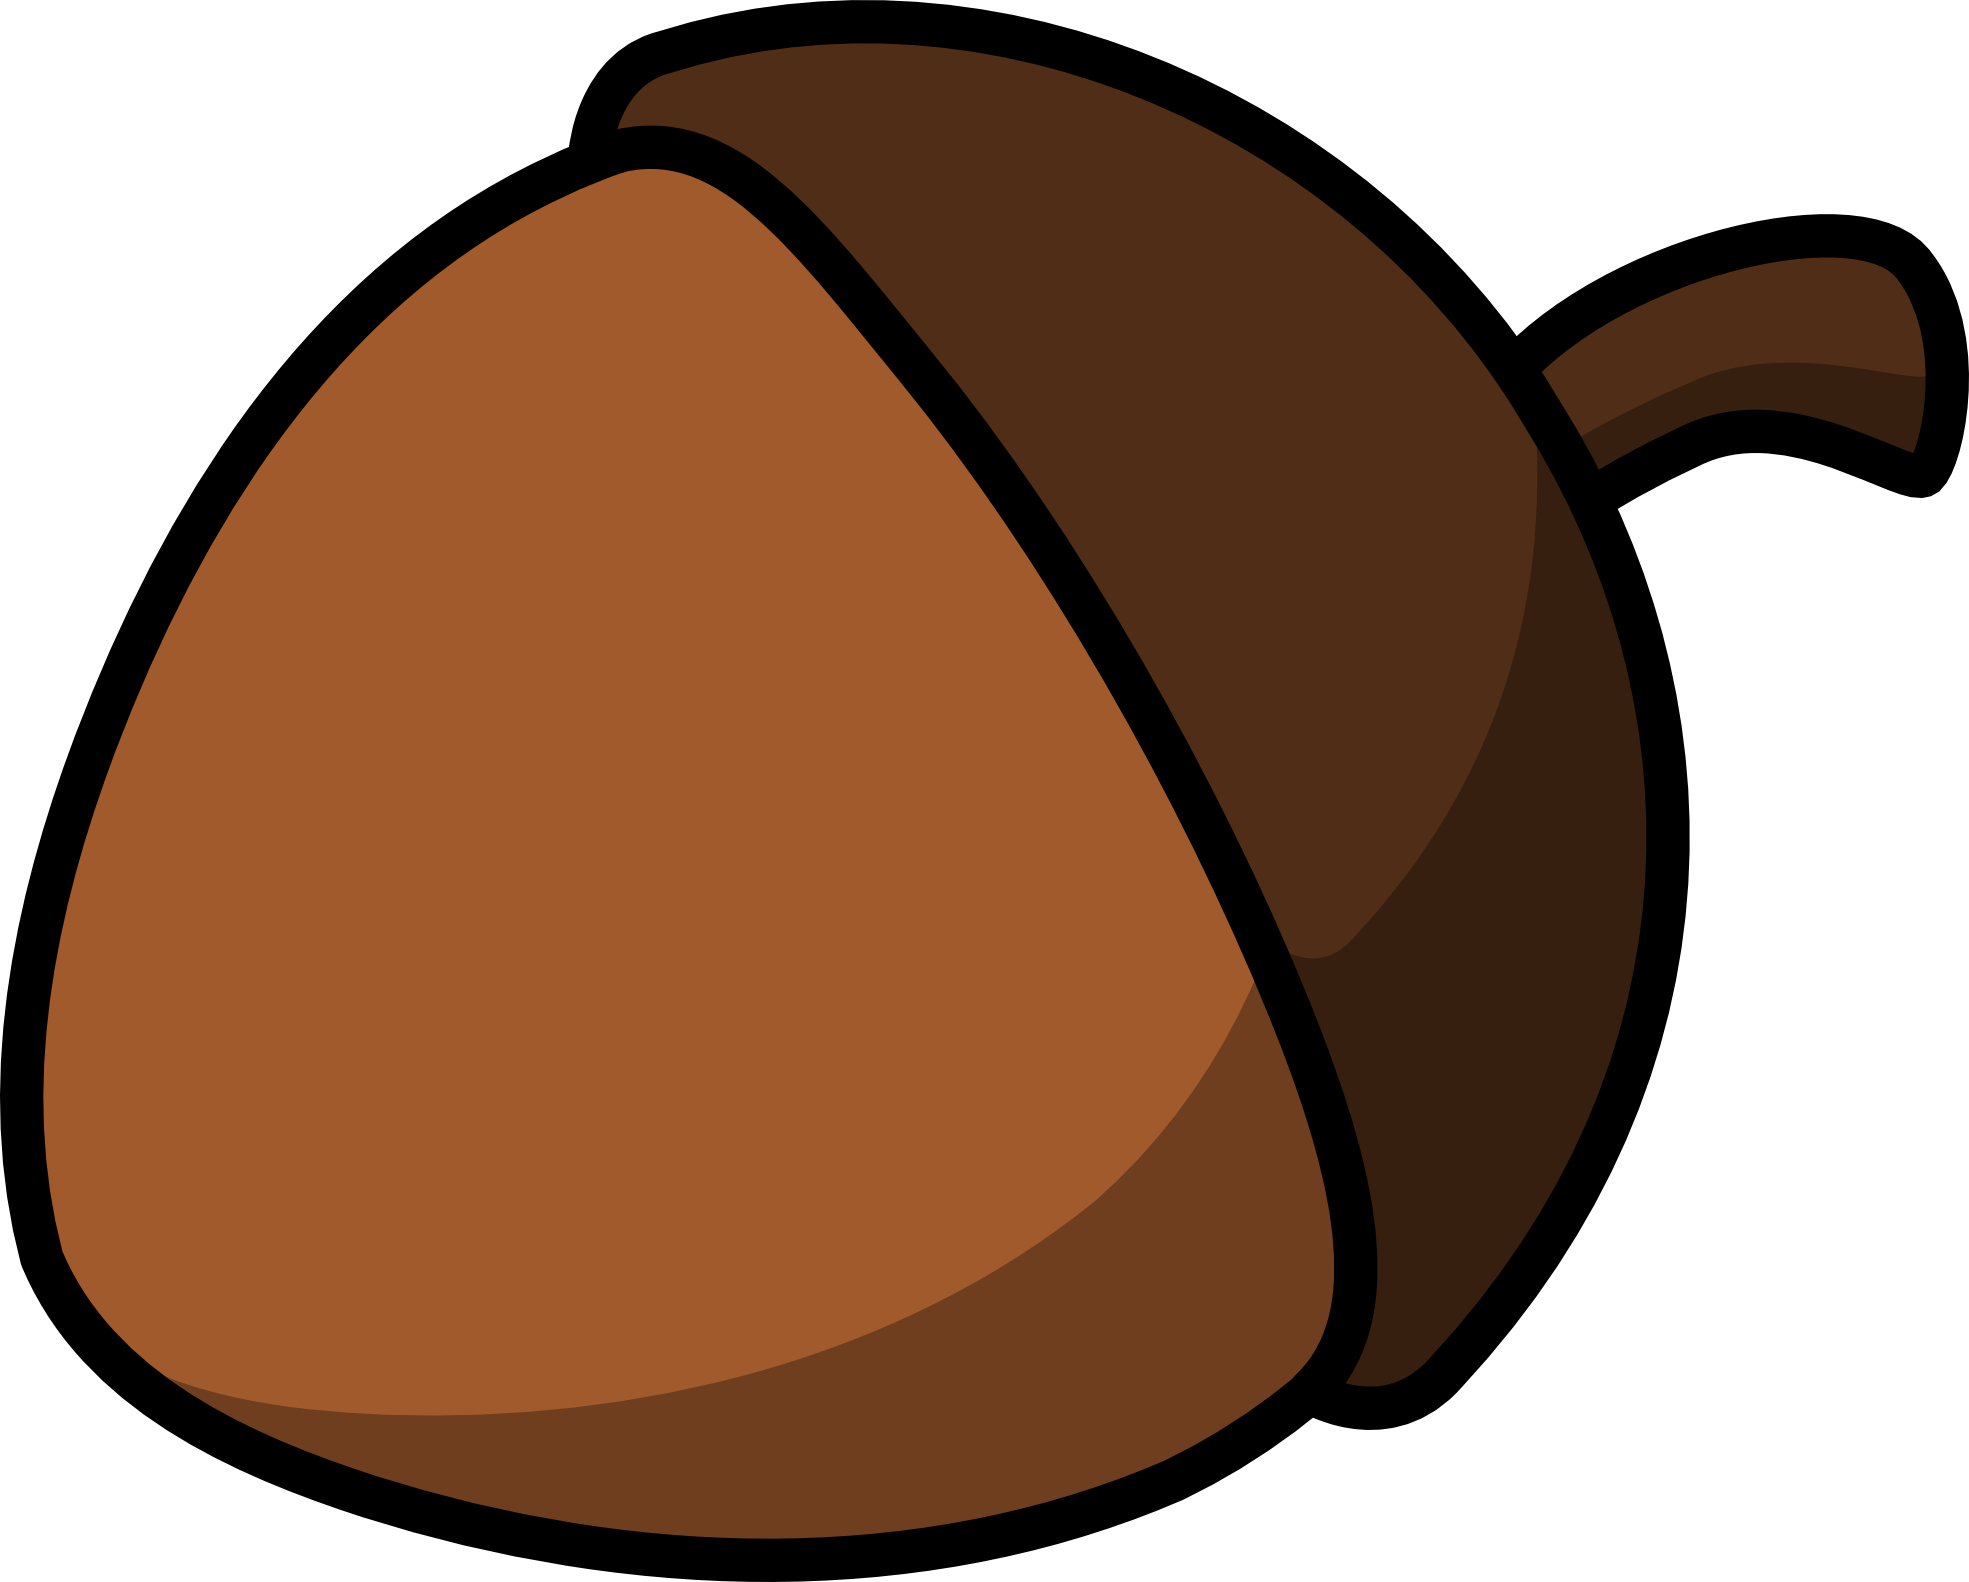 Acorn Clipart-Acorn Clipart-11